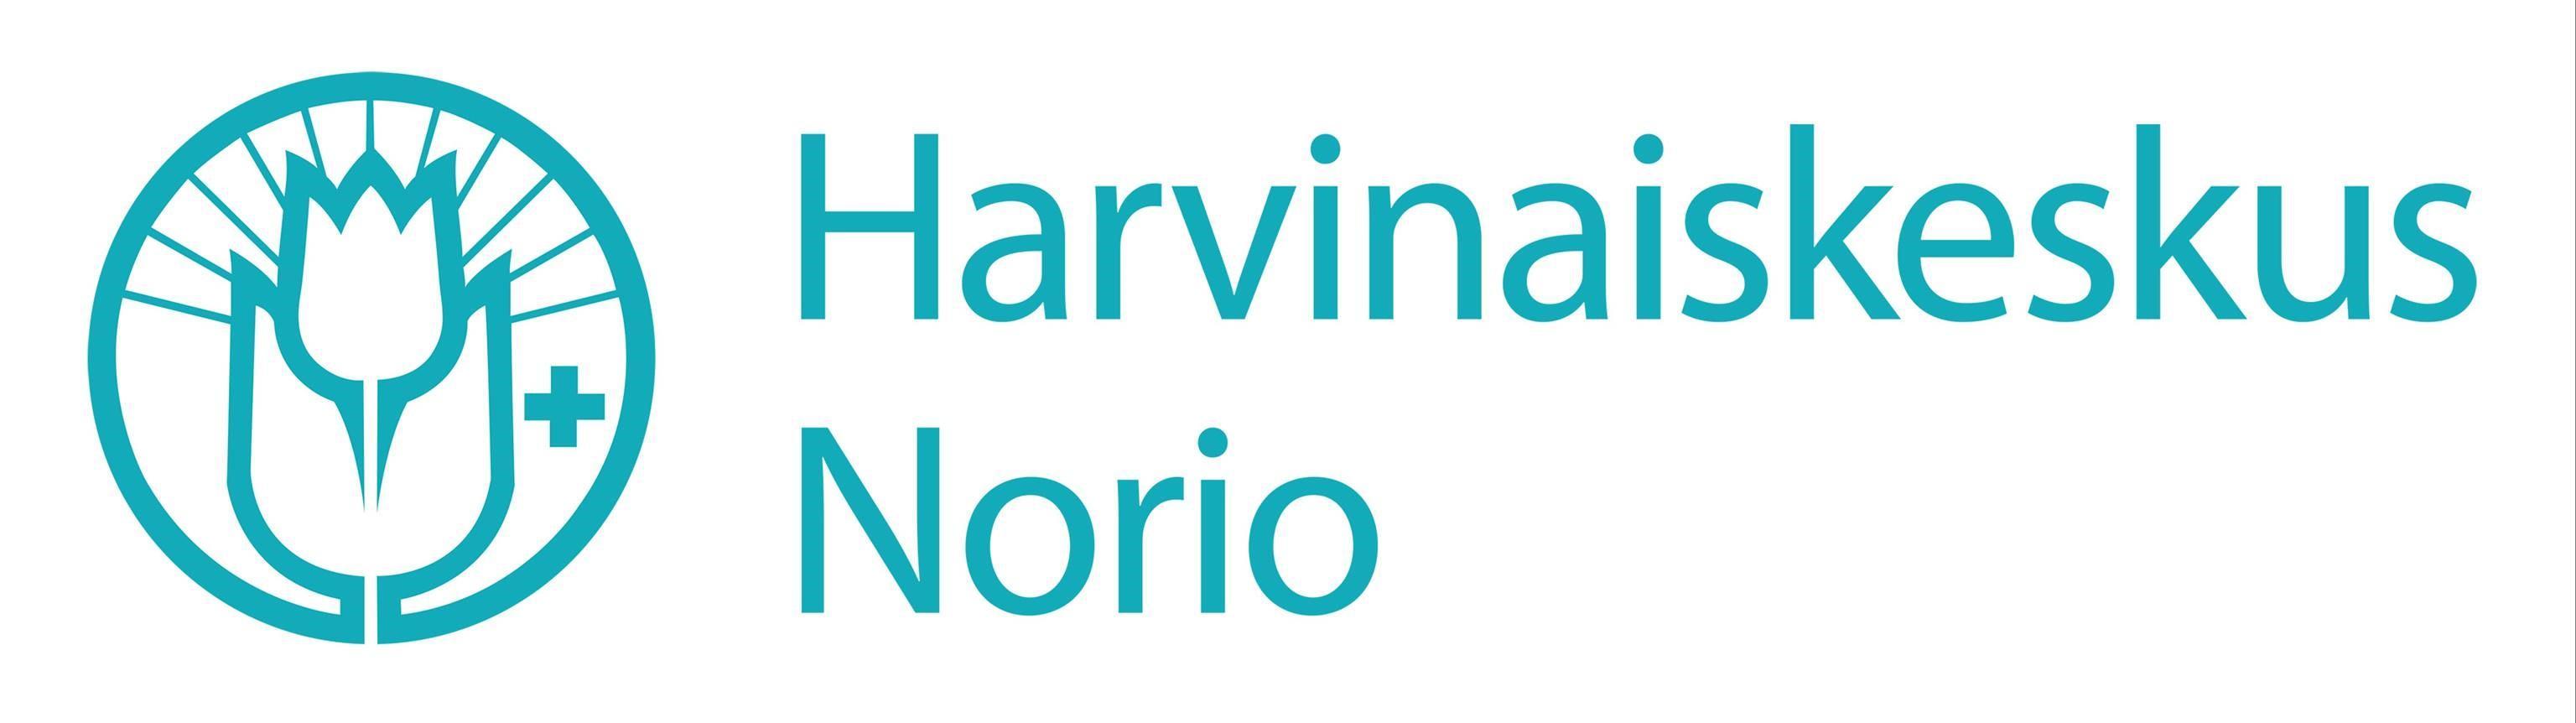 Harvinaiskeskus Norio-logo